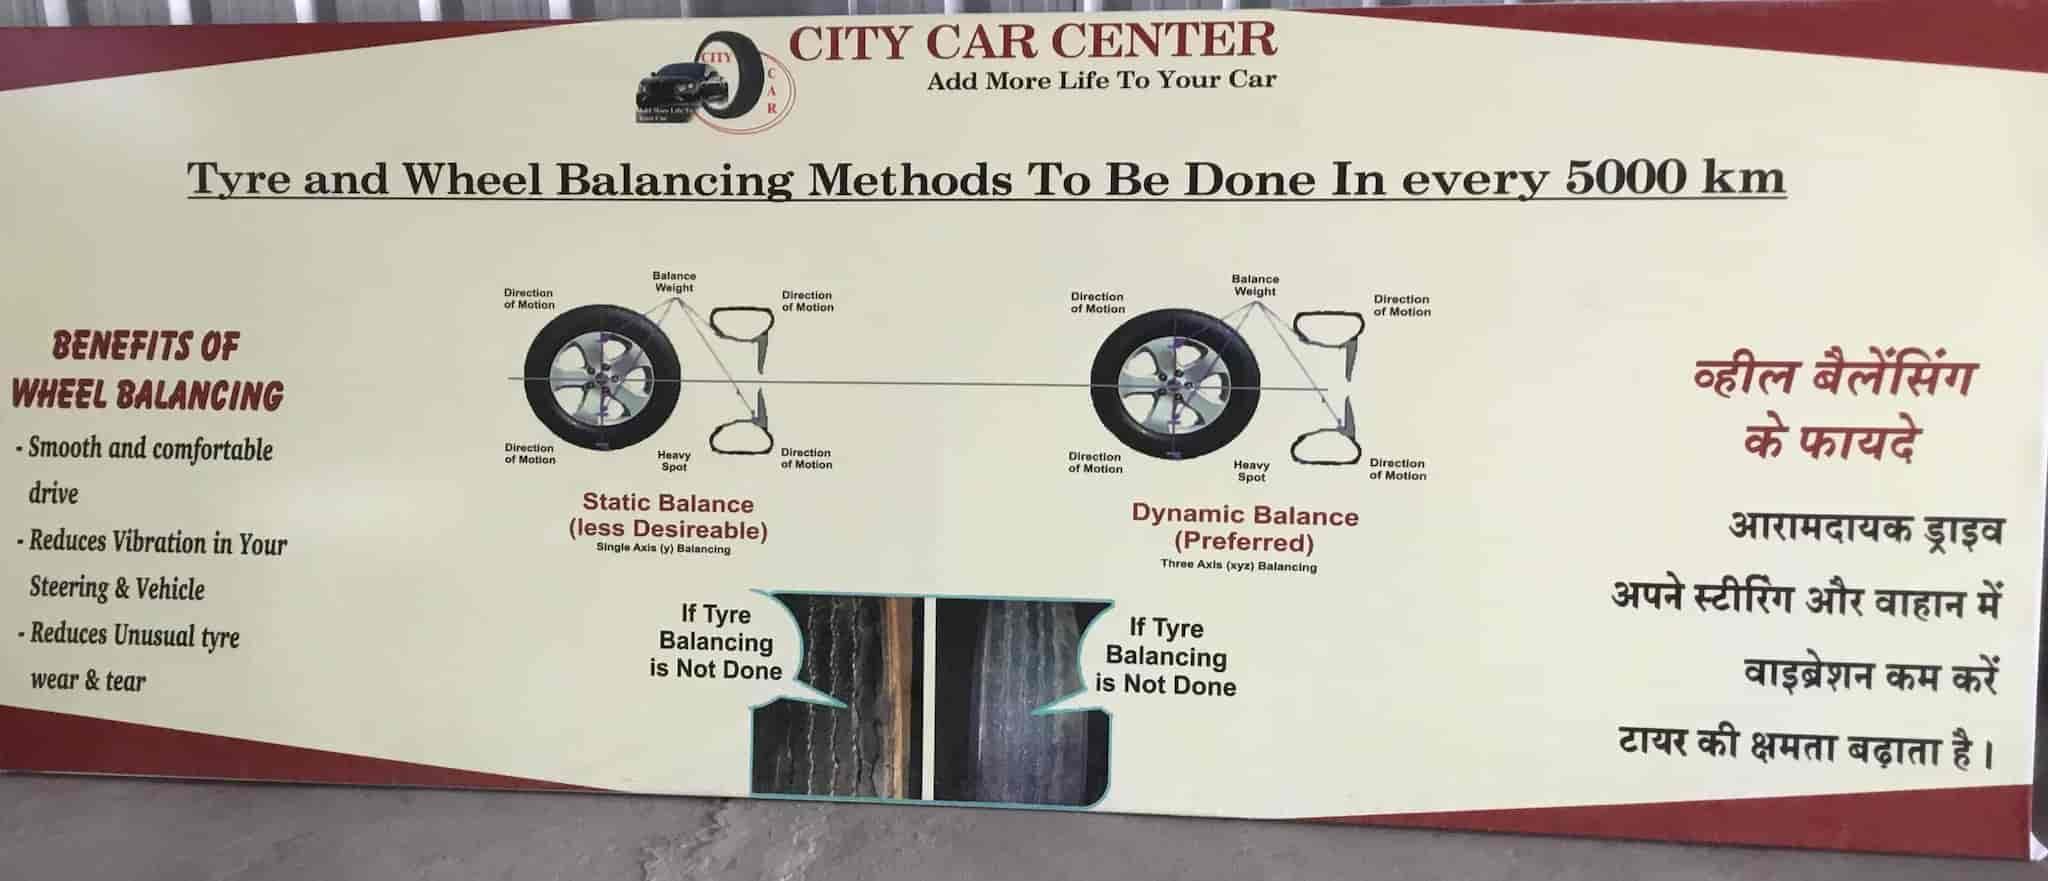 City Car Centre, Bhicholi Mardana - Car Cleaning Services in